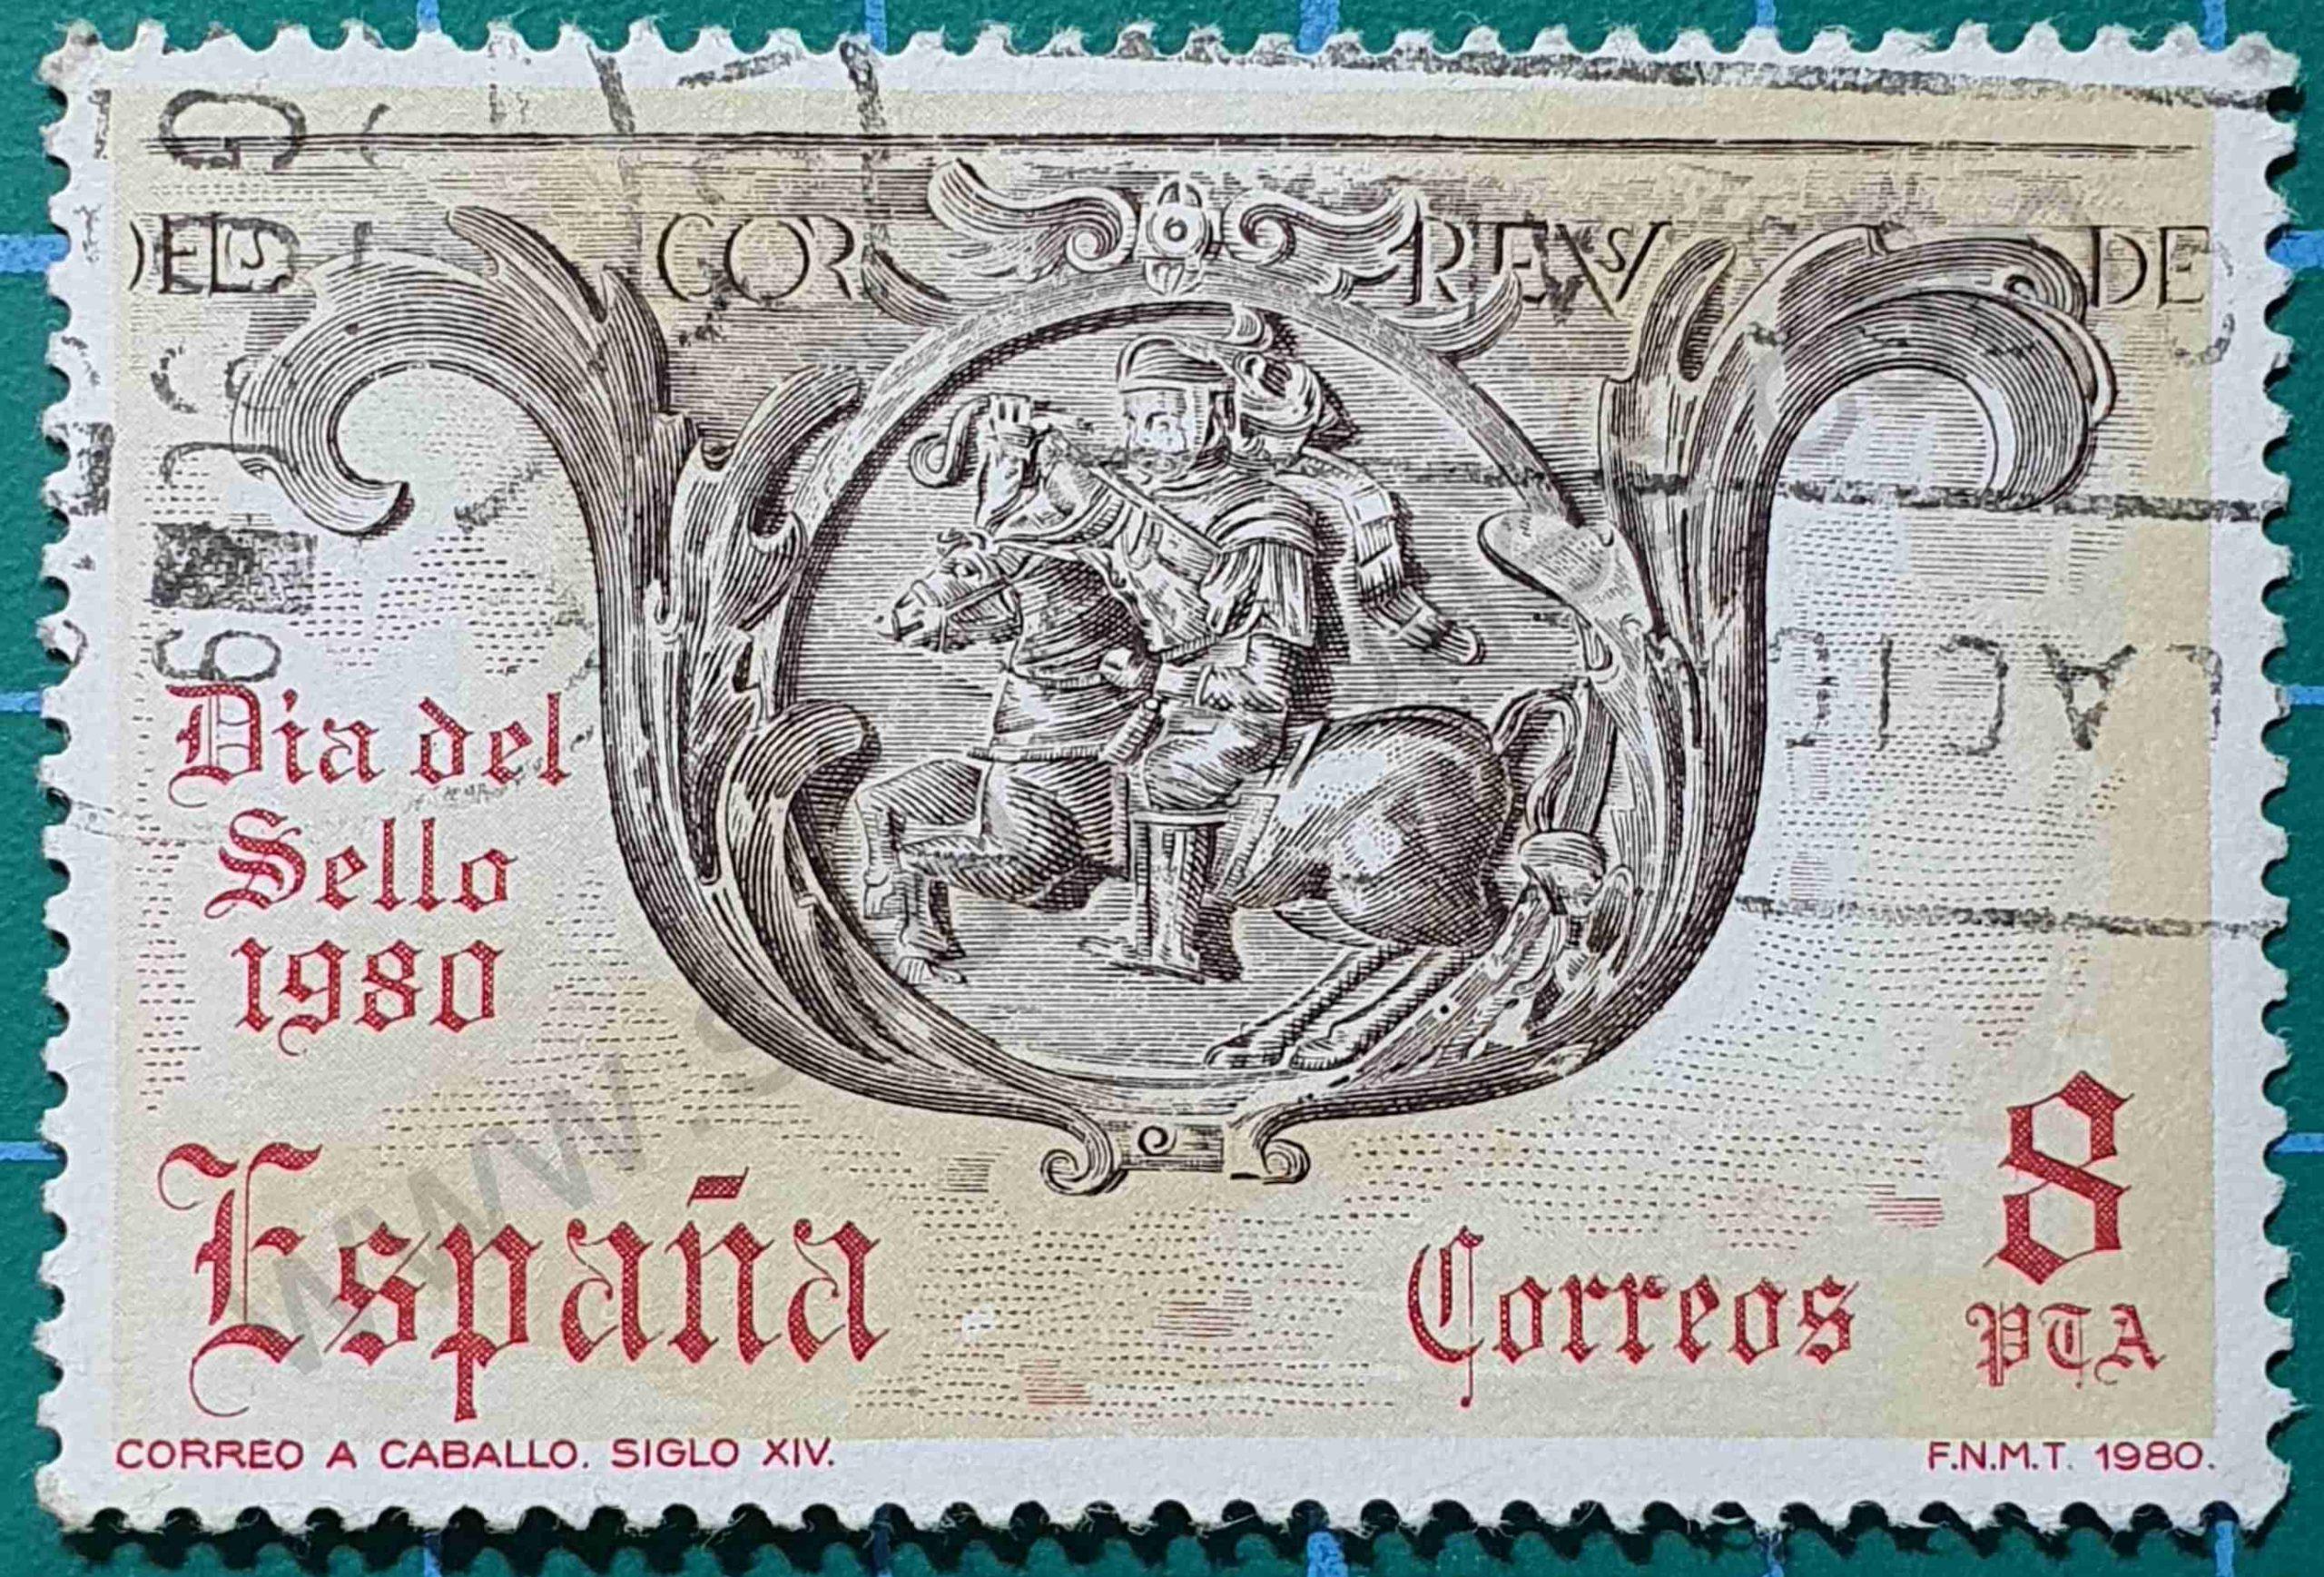 Día del sello 1980 - España